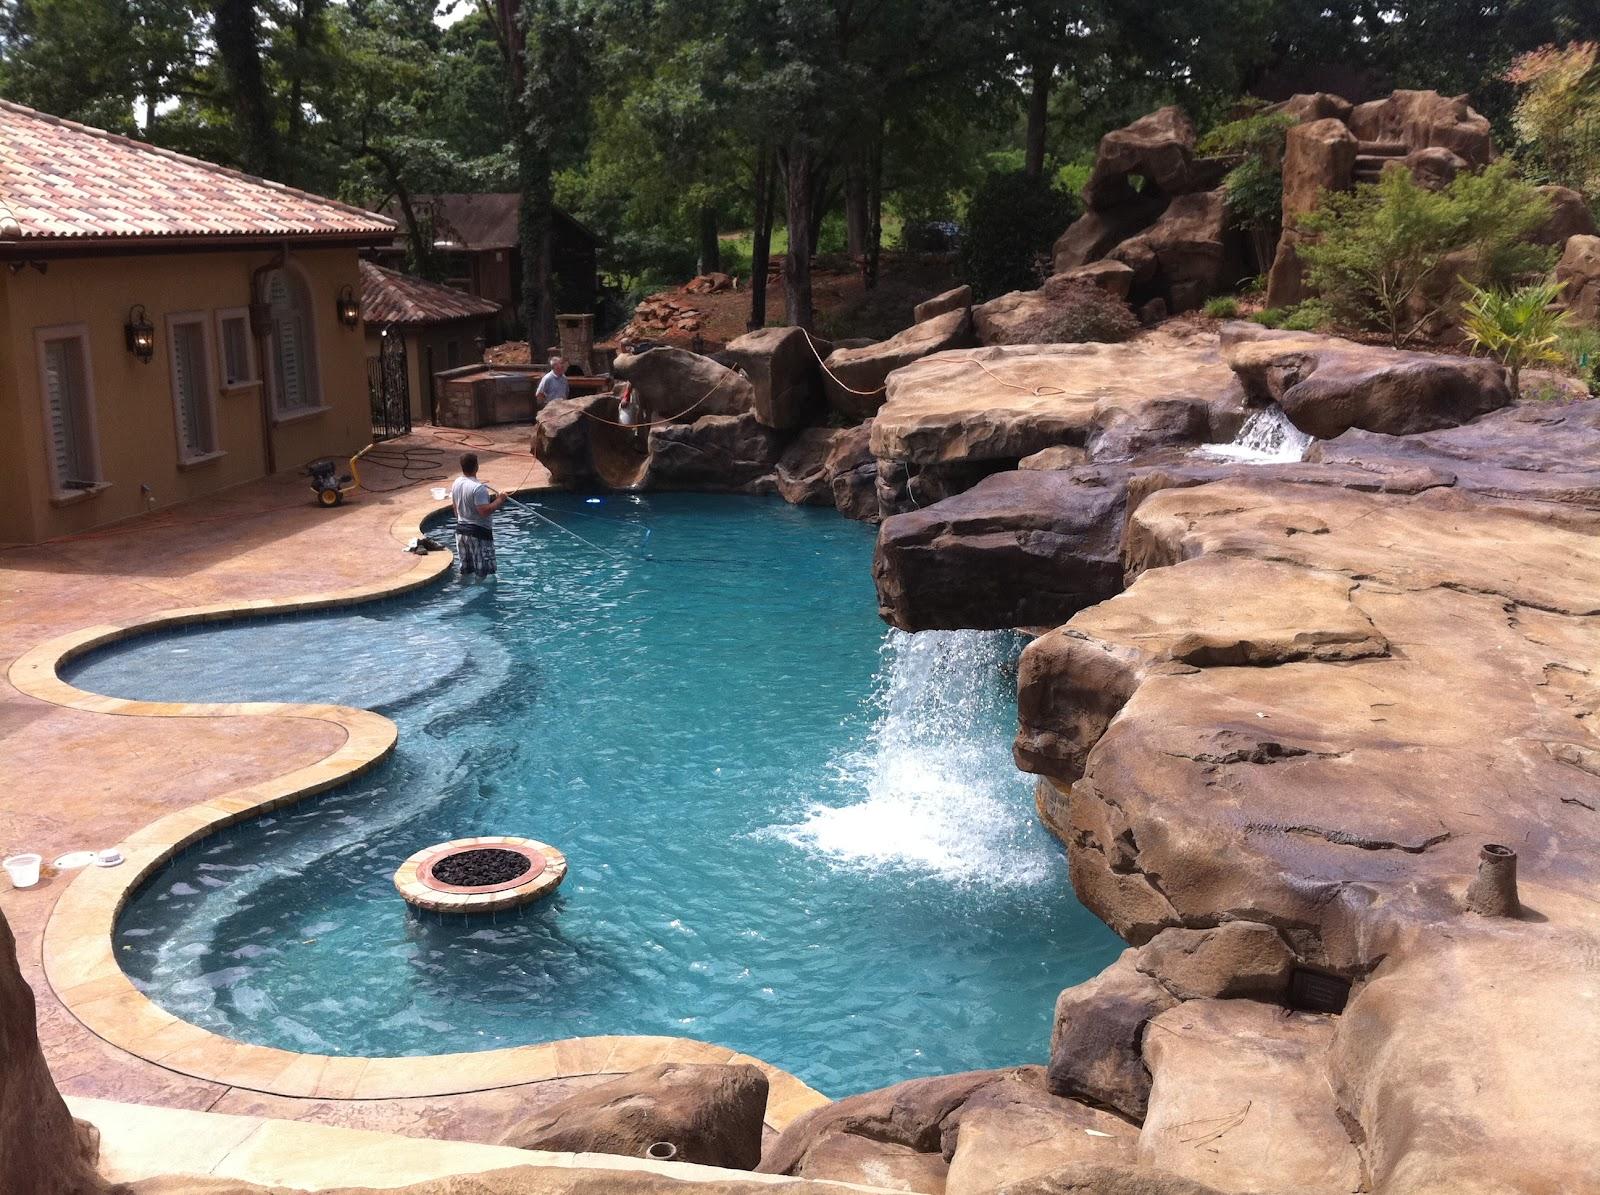 Backyard Oasis Pools: Custom Pool & Faux Rock Grotto & 40 ...